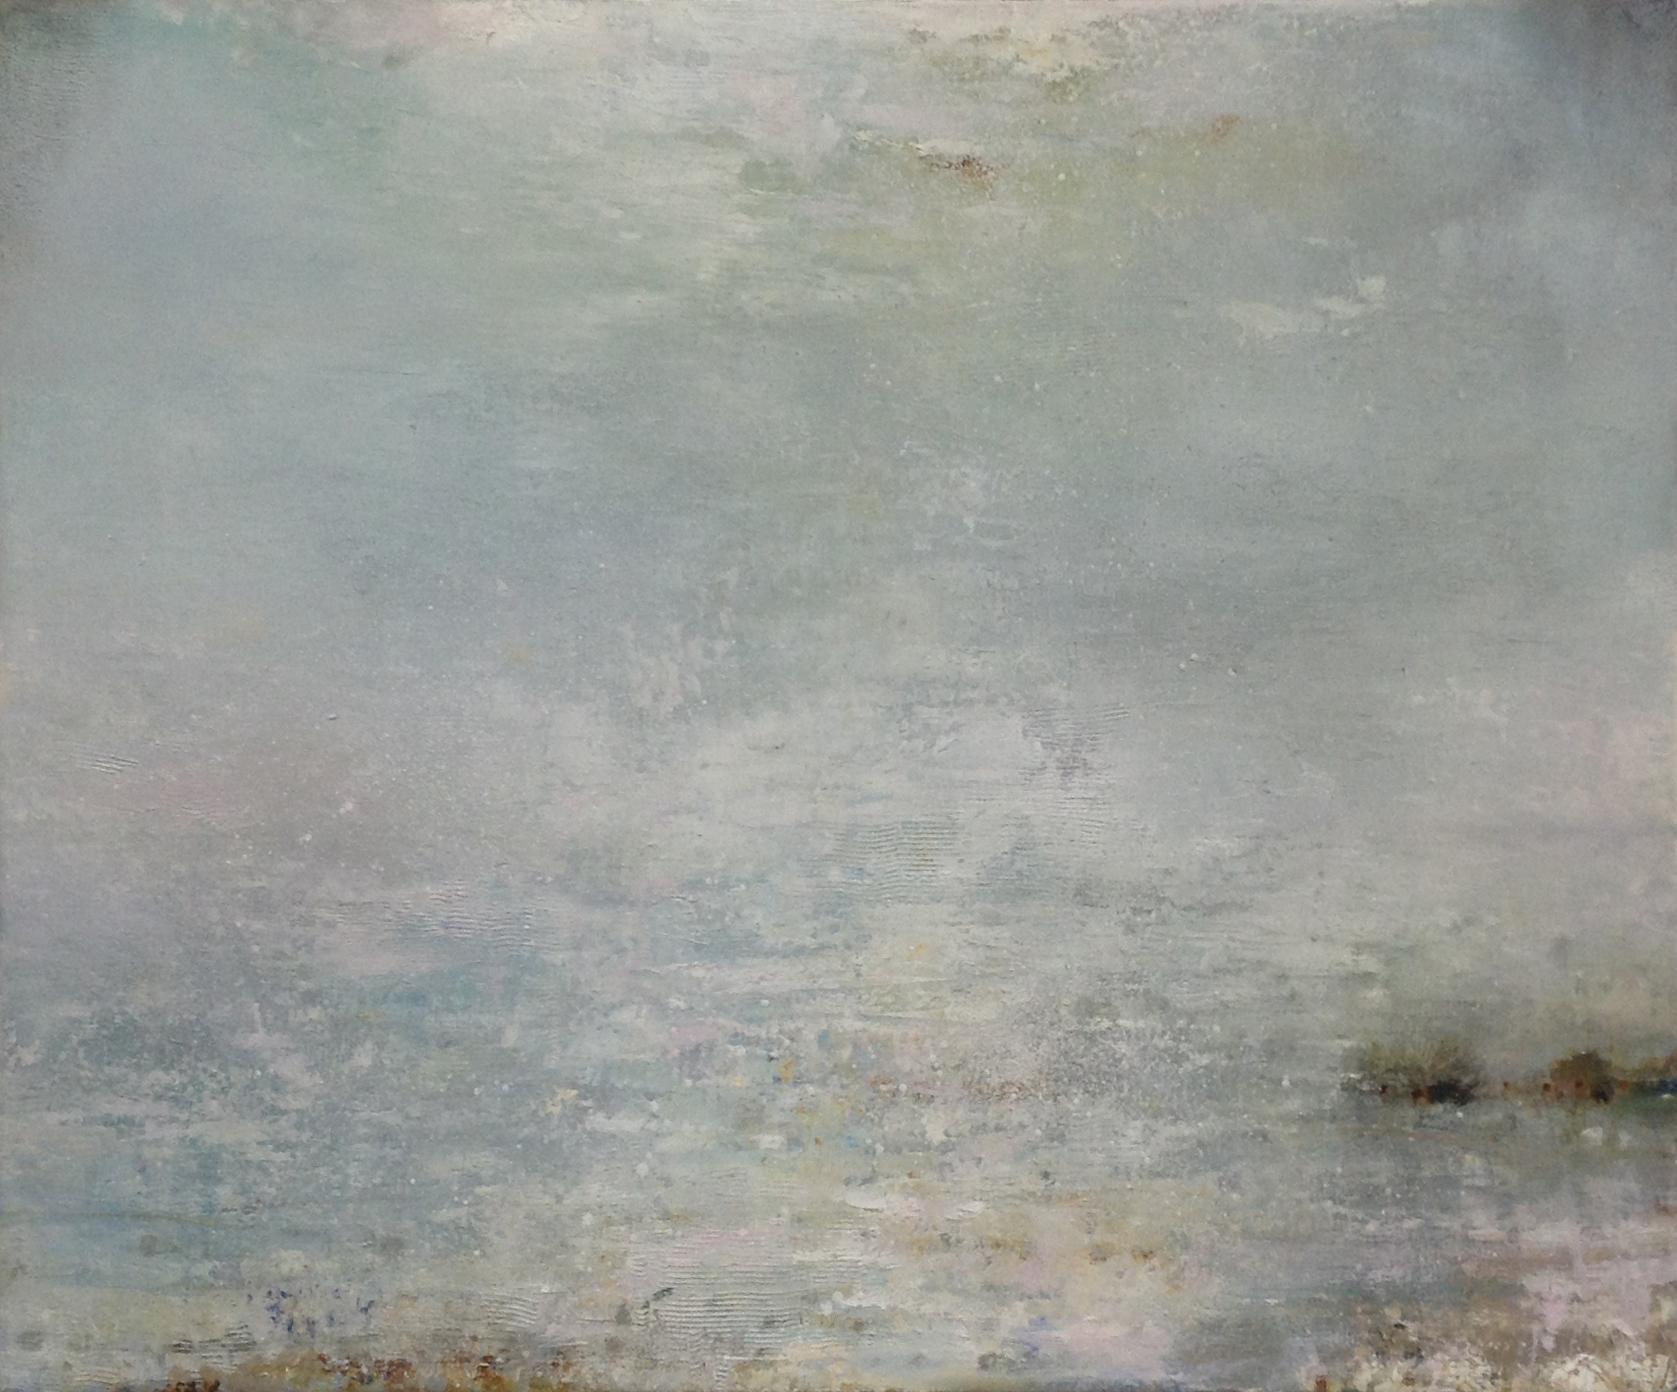 Gareth Edwards RWA Wilder Shores of Love 60 x 50 cm oil on board S O L D